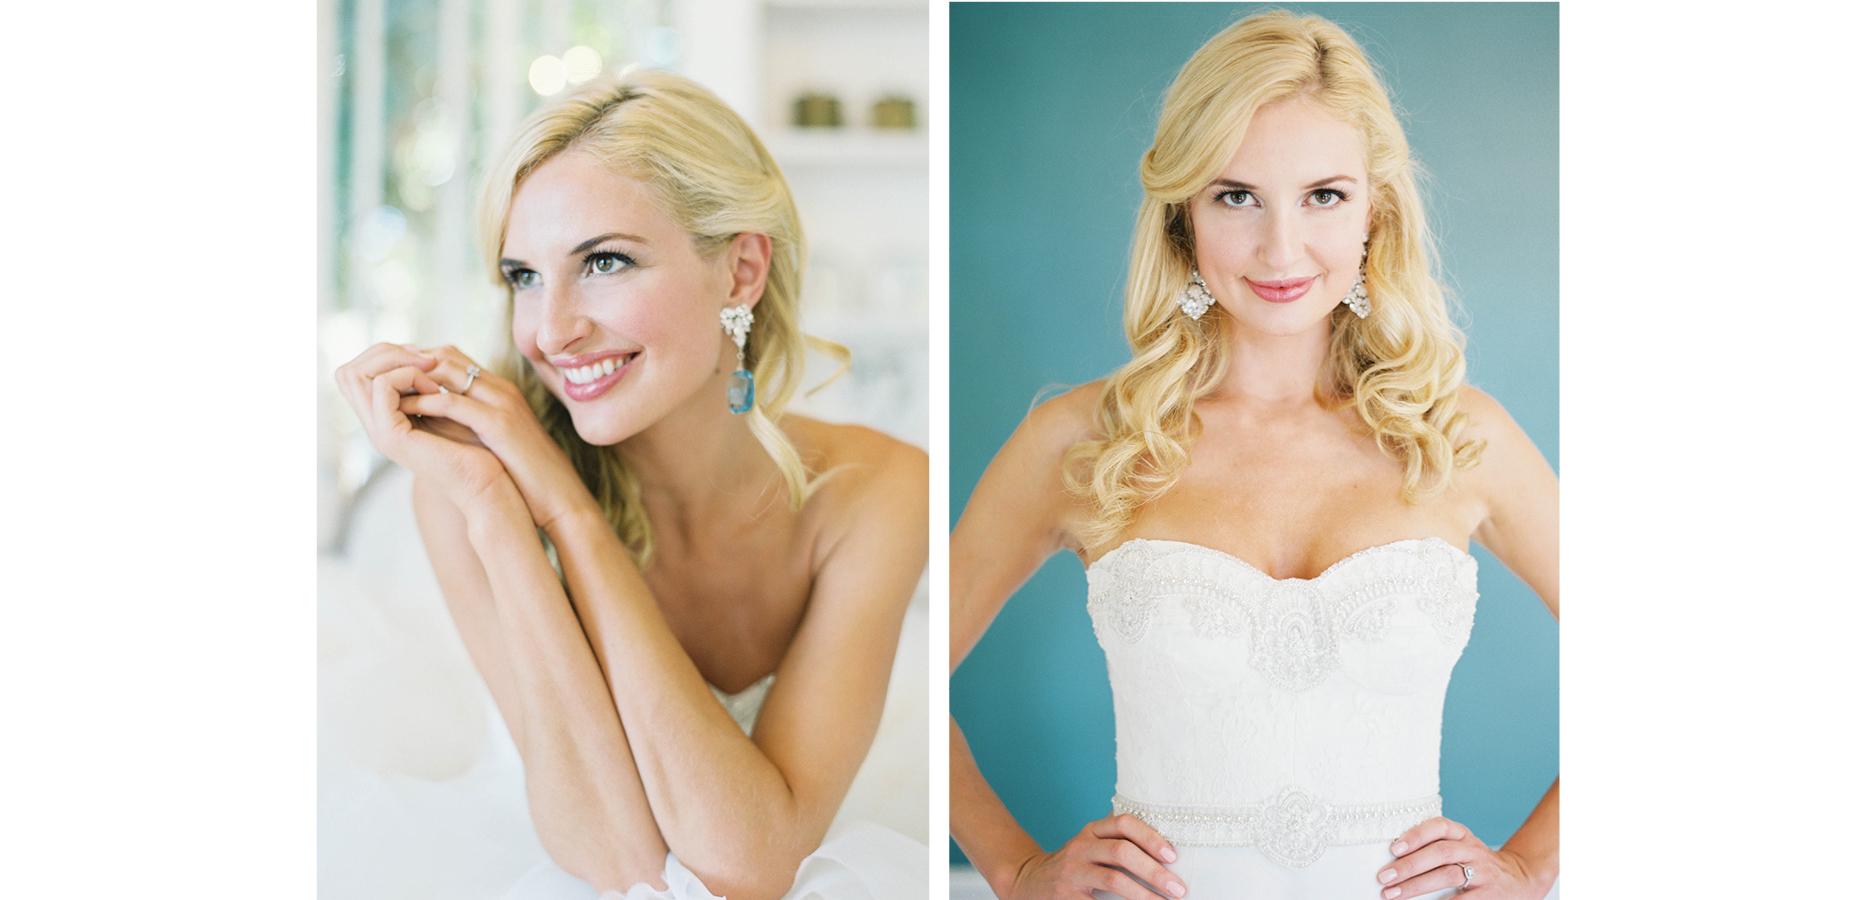 Jess-Wilcox-Hair-Makeup-Wedding_portfolio4.jpg